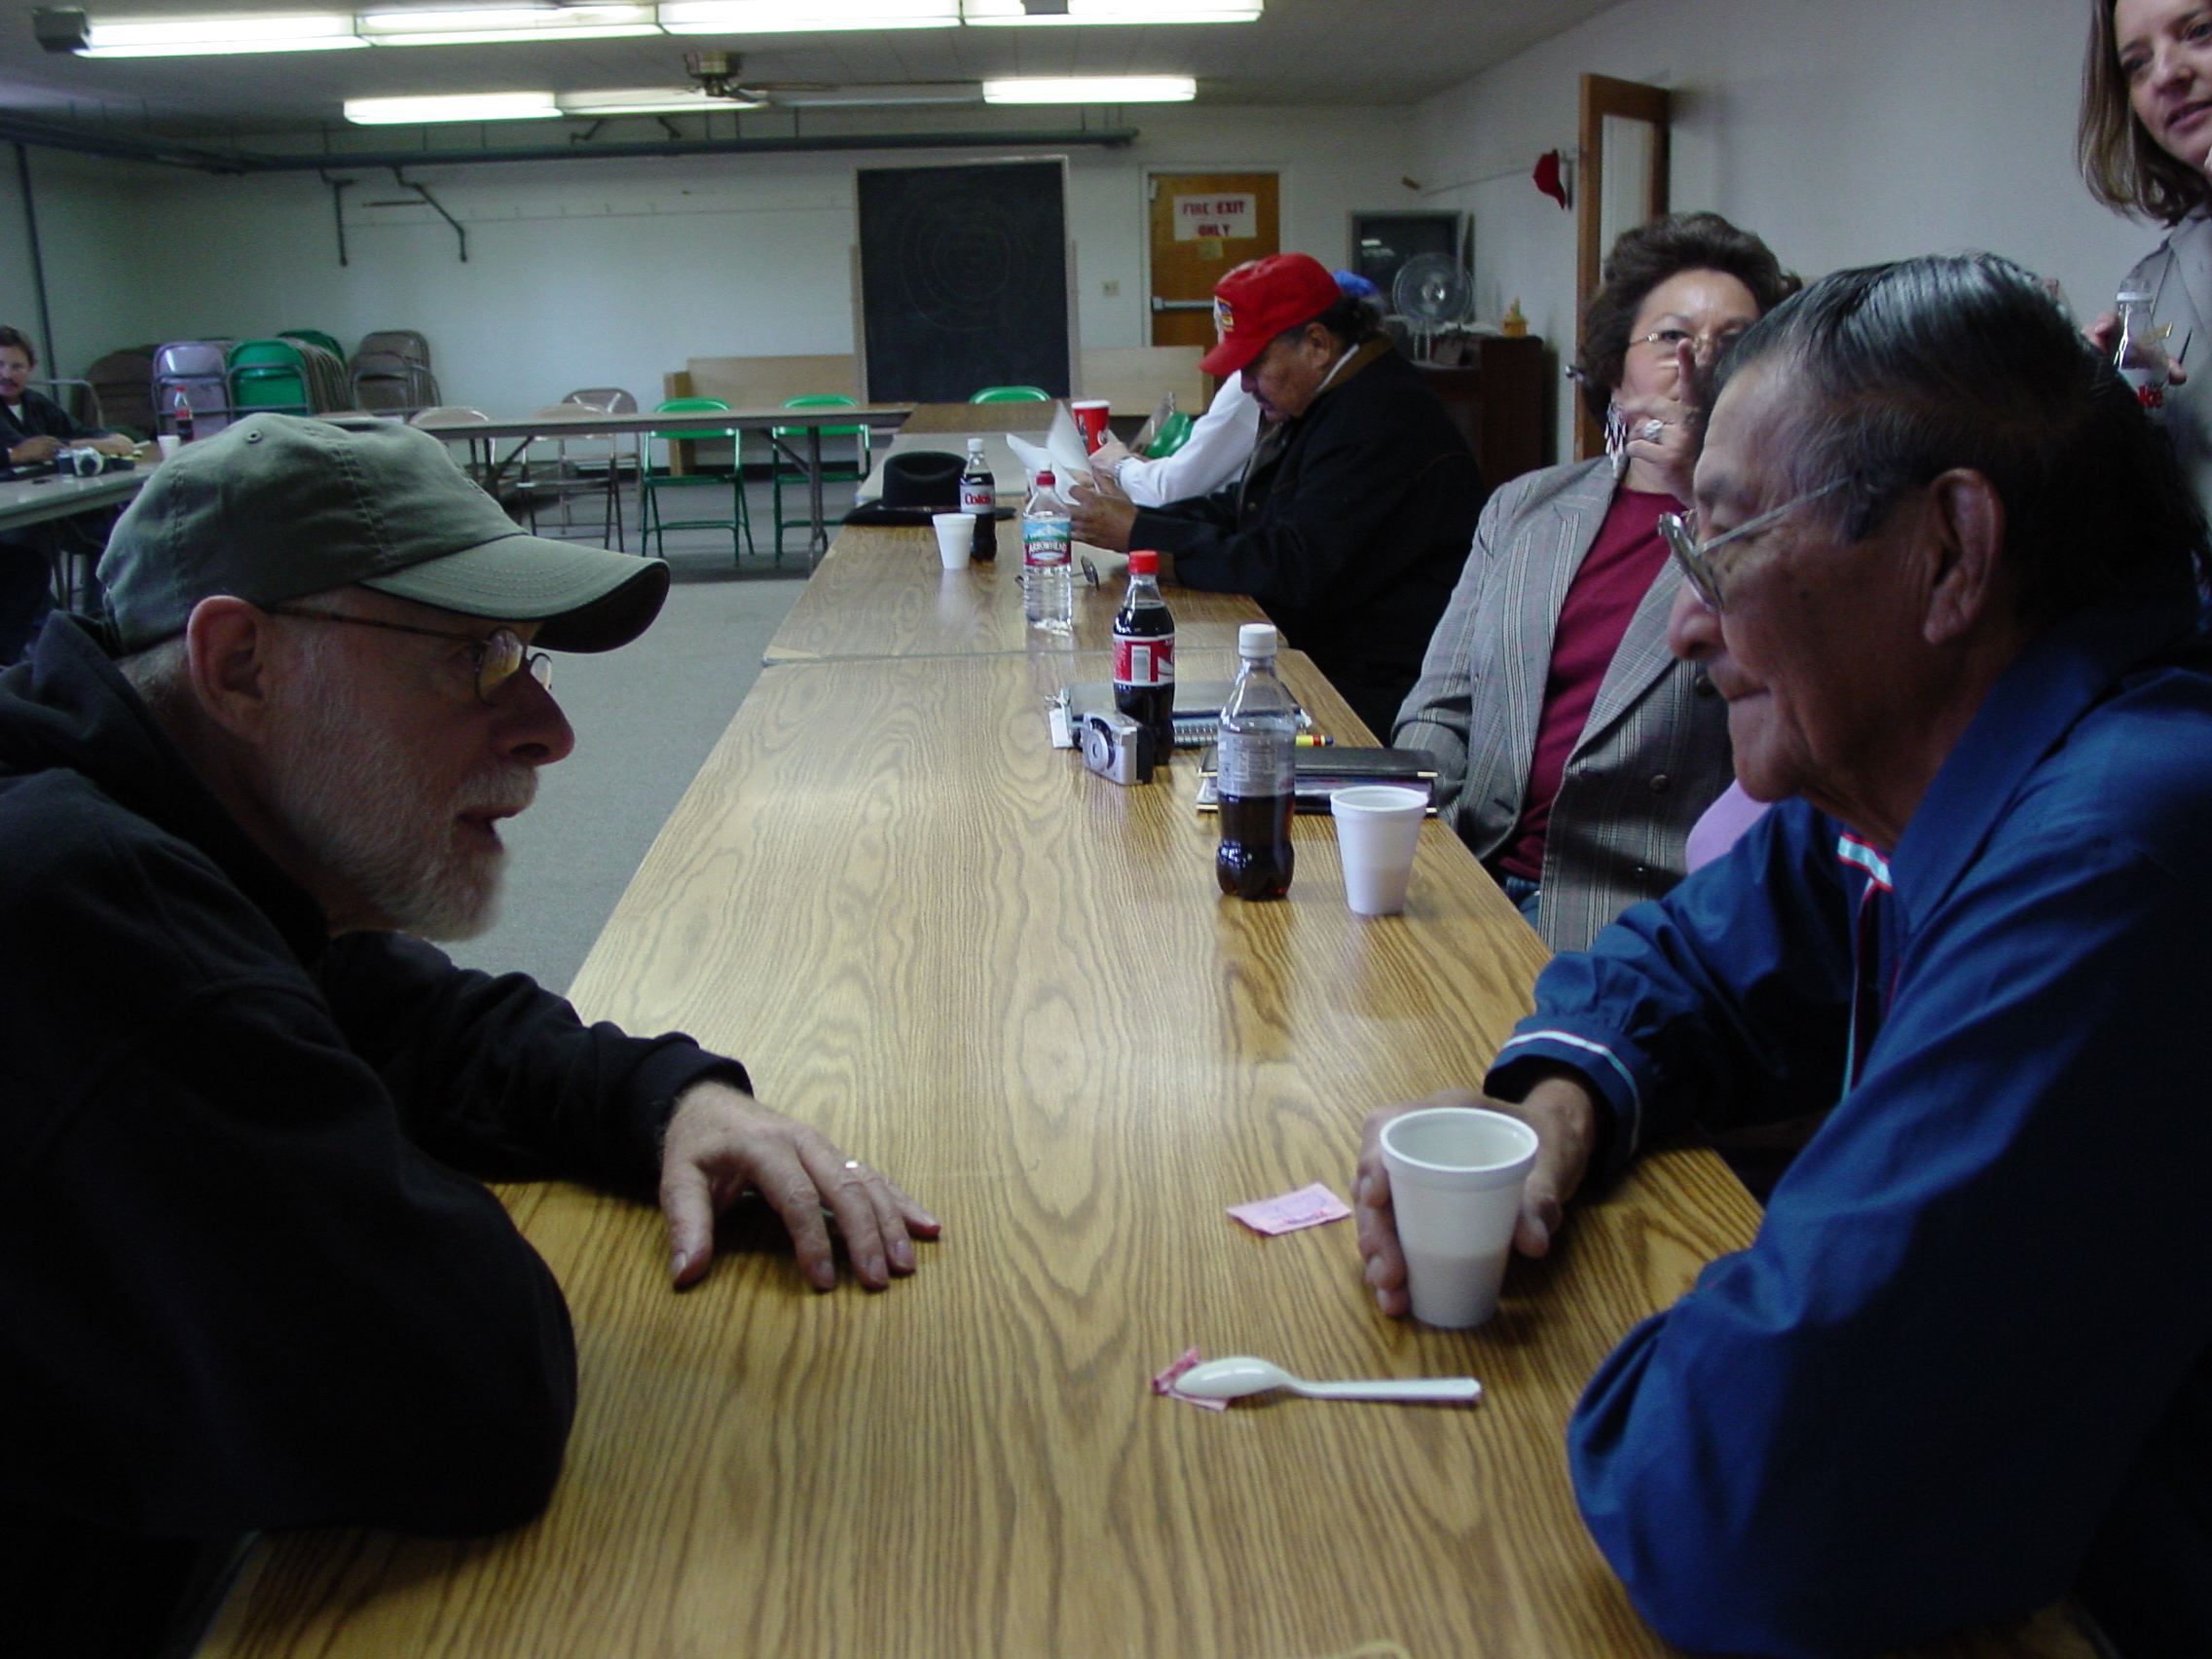 Donald L. Vasicek-Writer/Filmmaker - Cheyenne Chief Laird Cometsevah